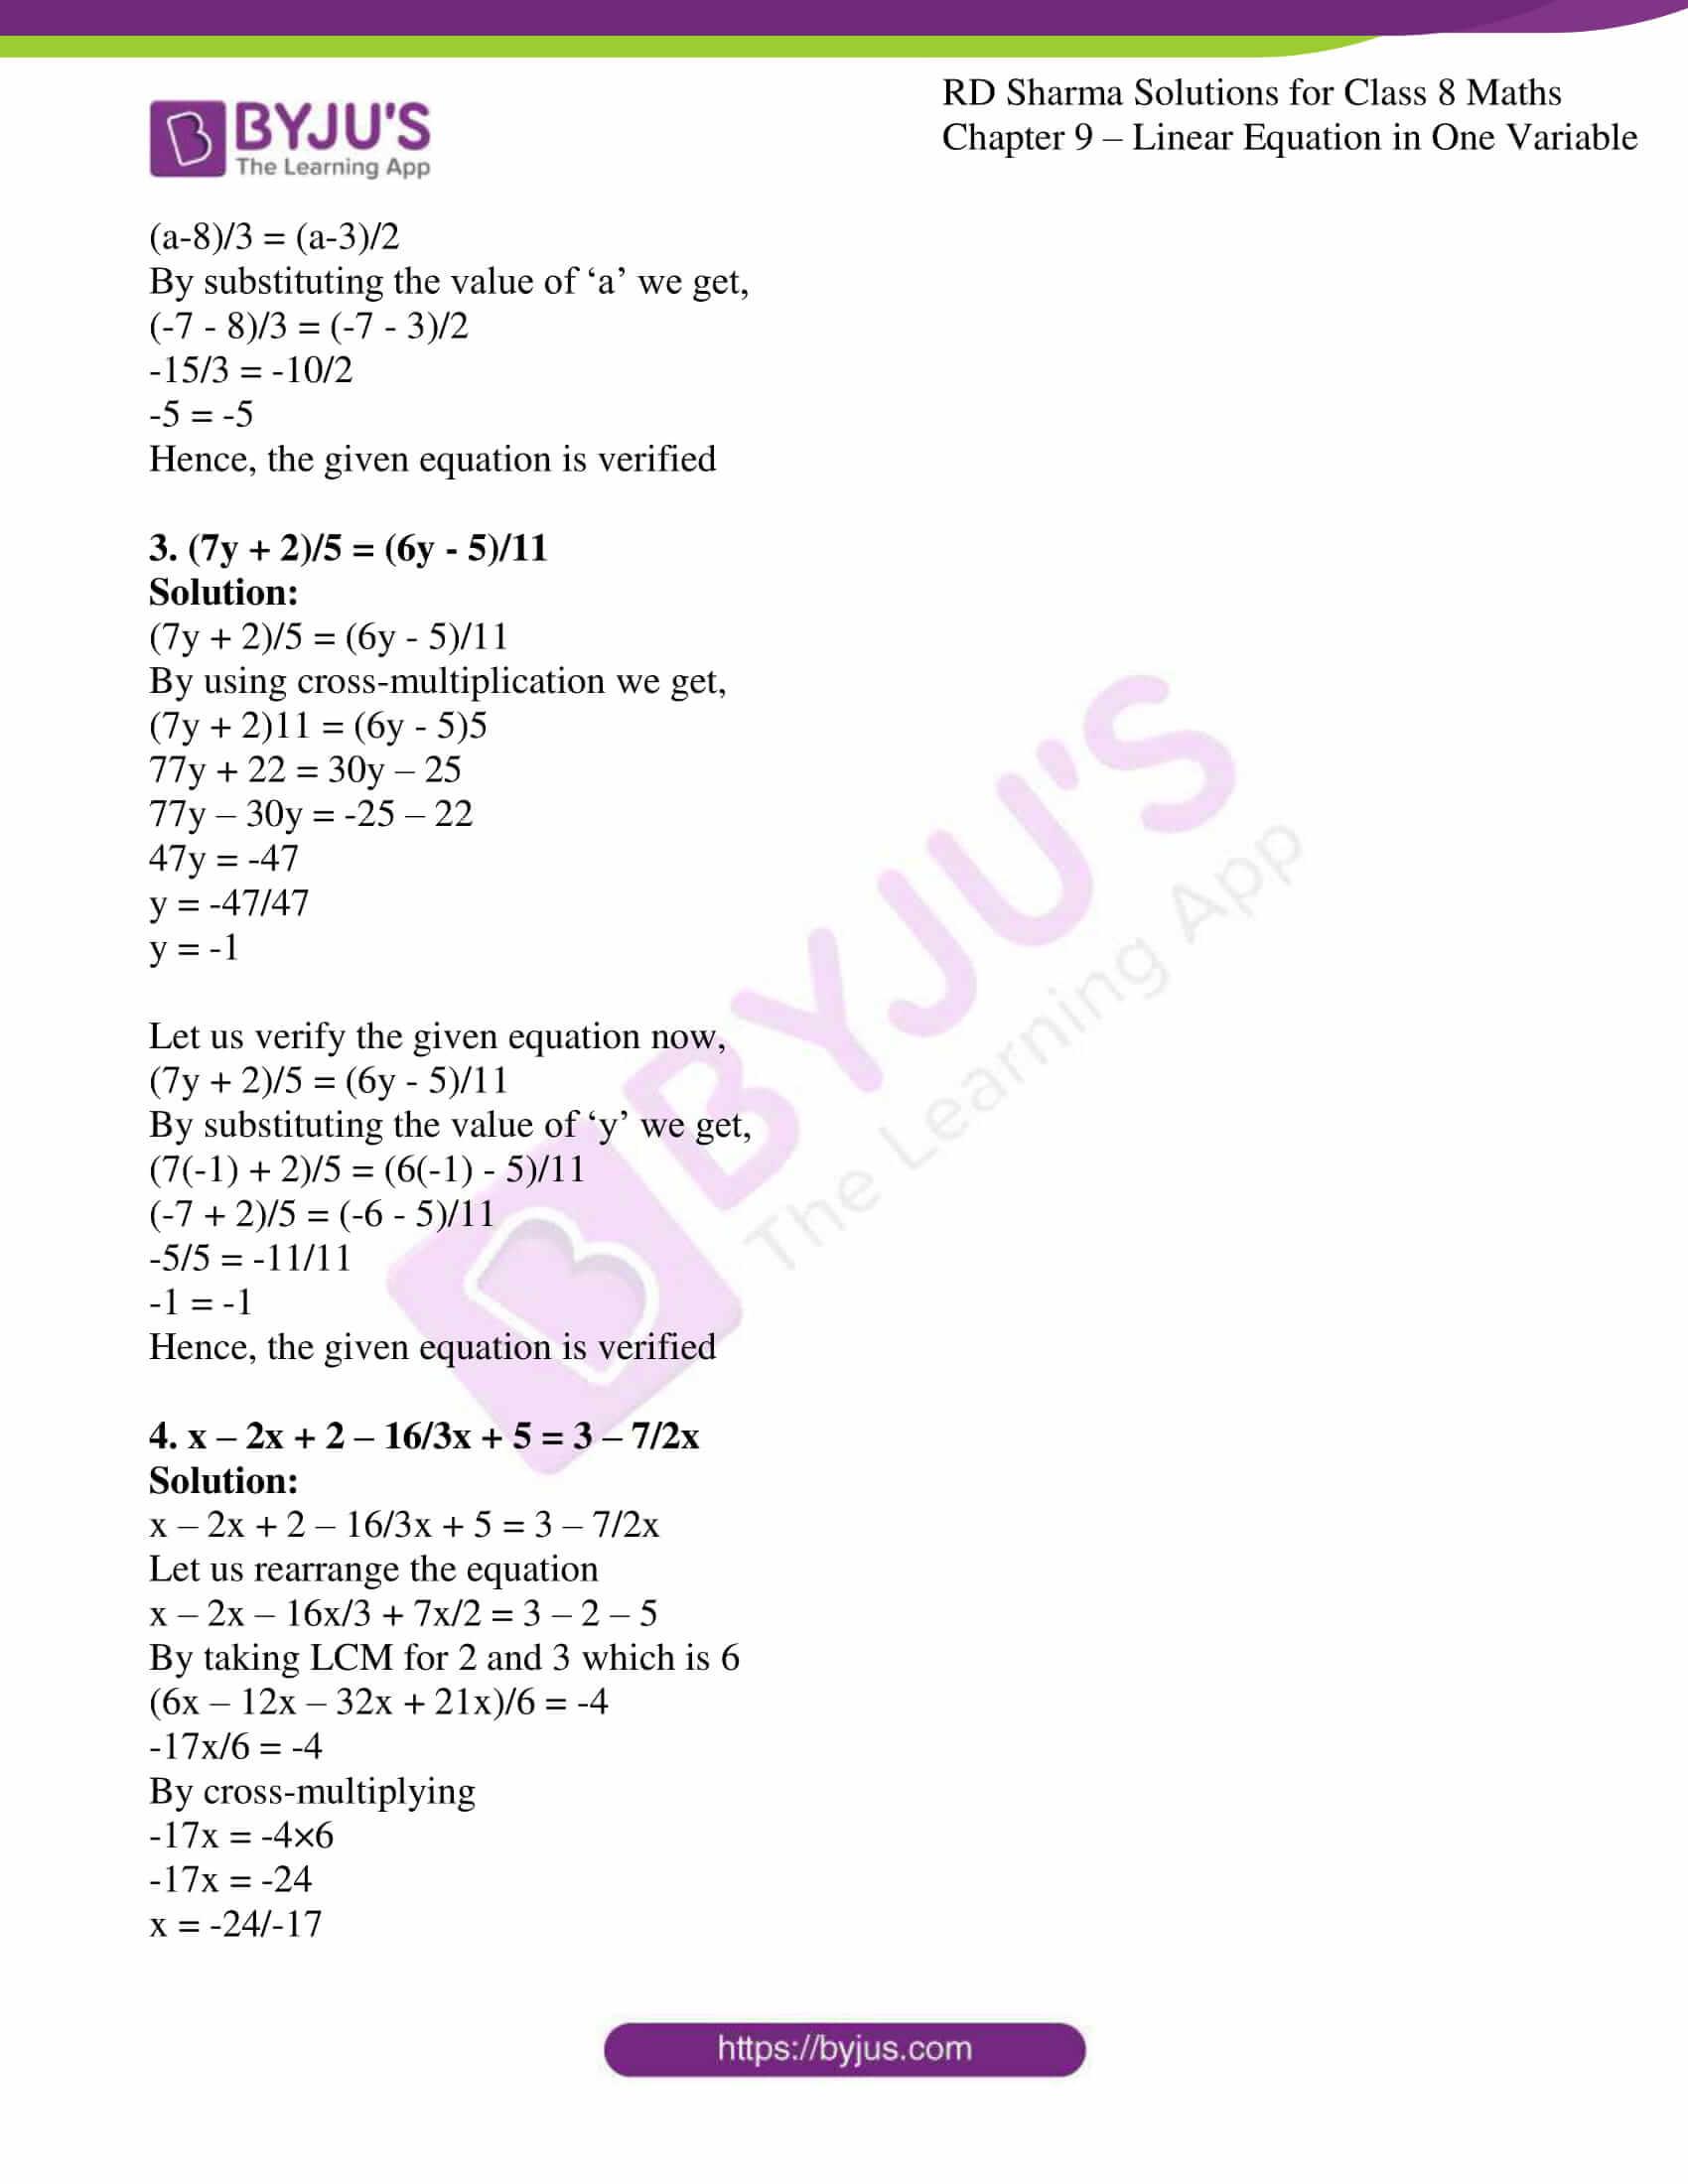 rd sharma class 8 maths chapter 9 exercise 2 02